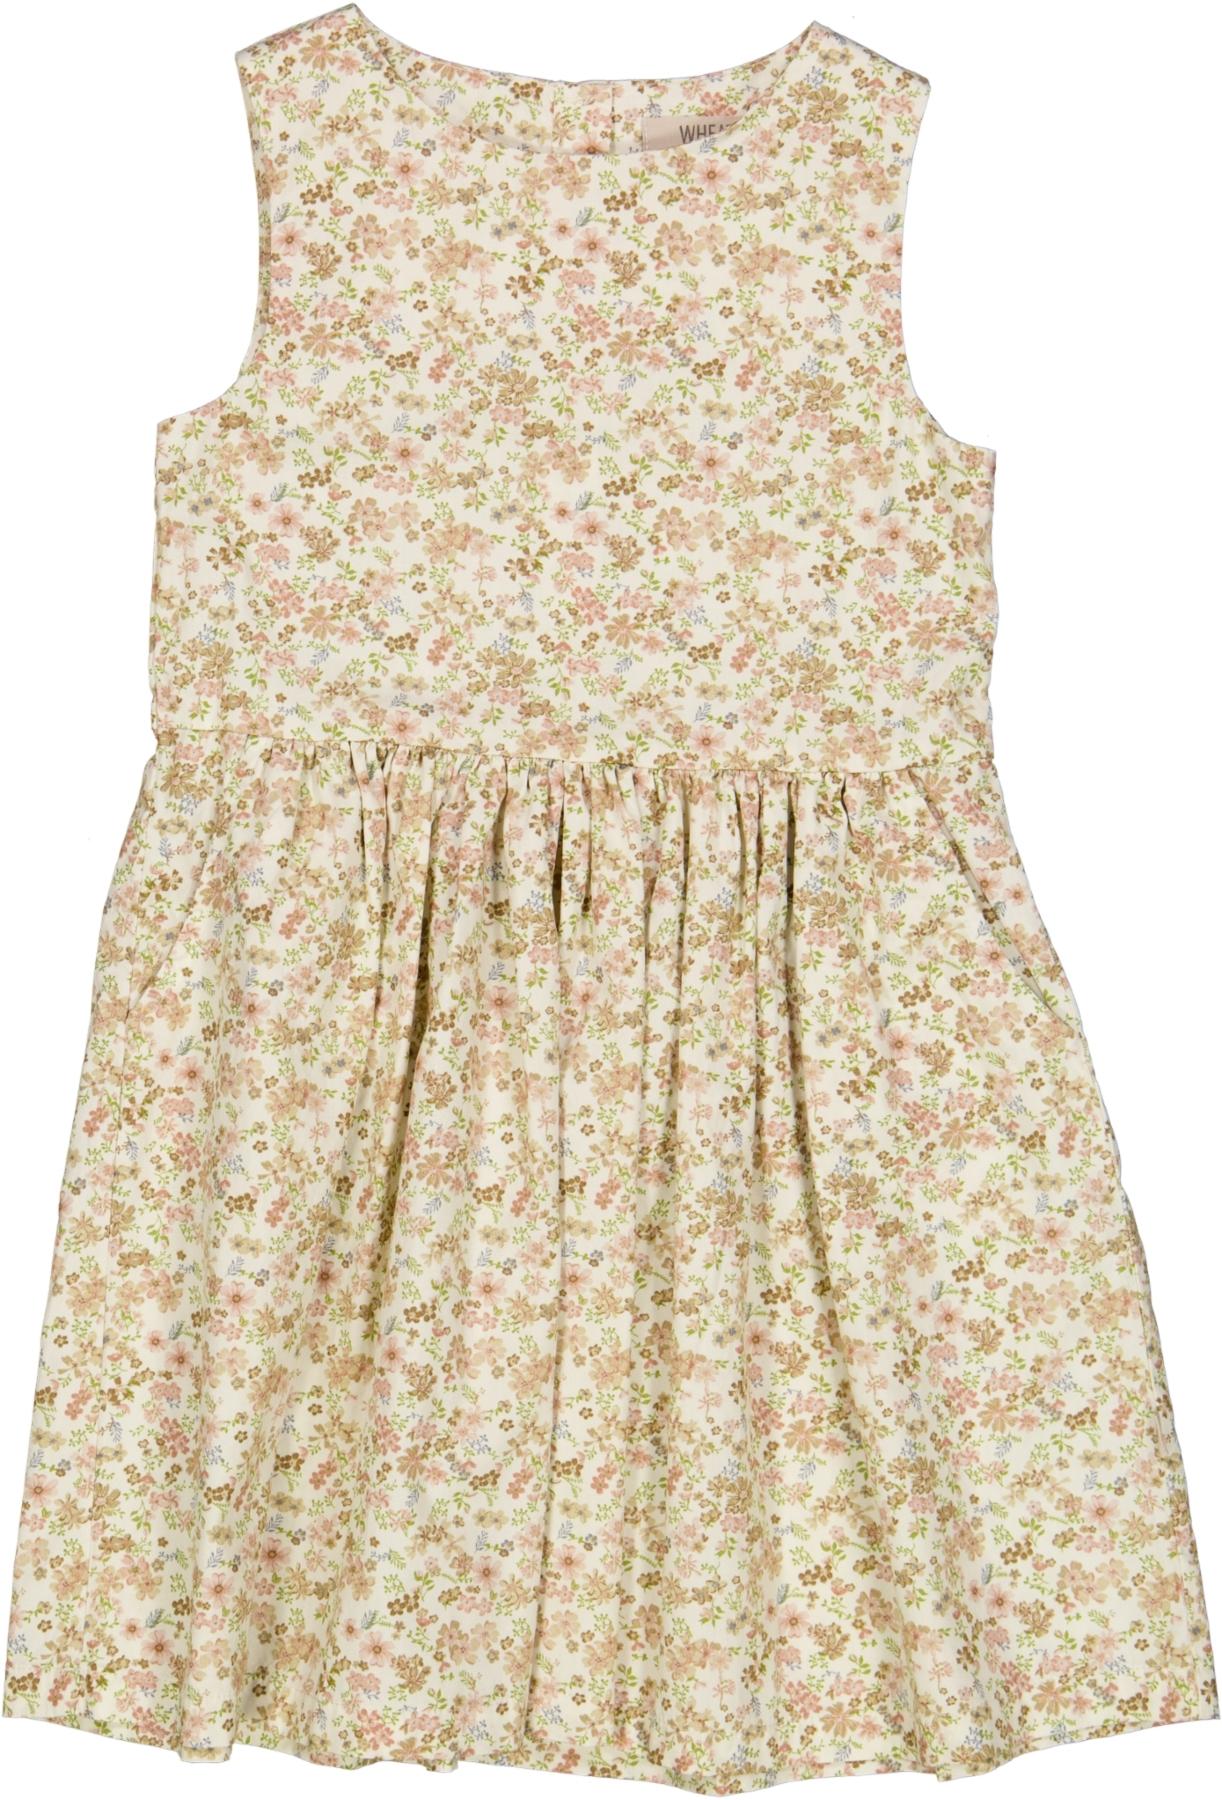 Wheat Thelma kjole